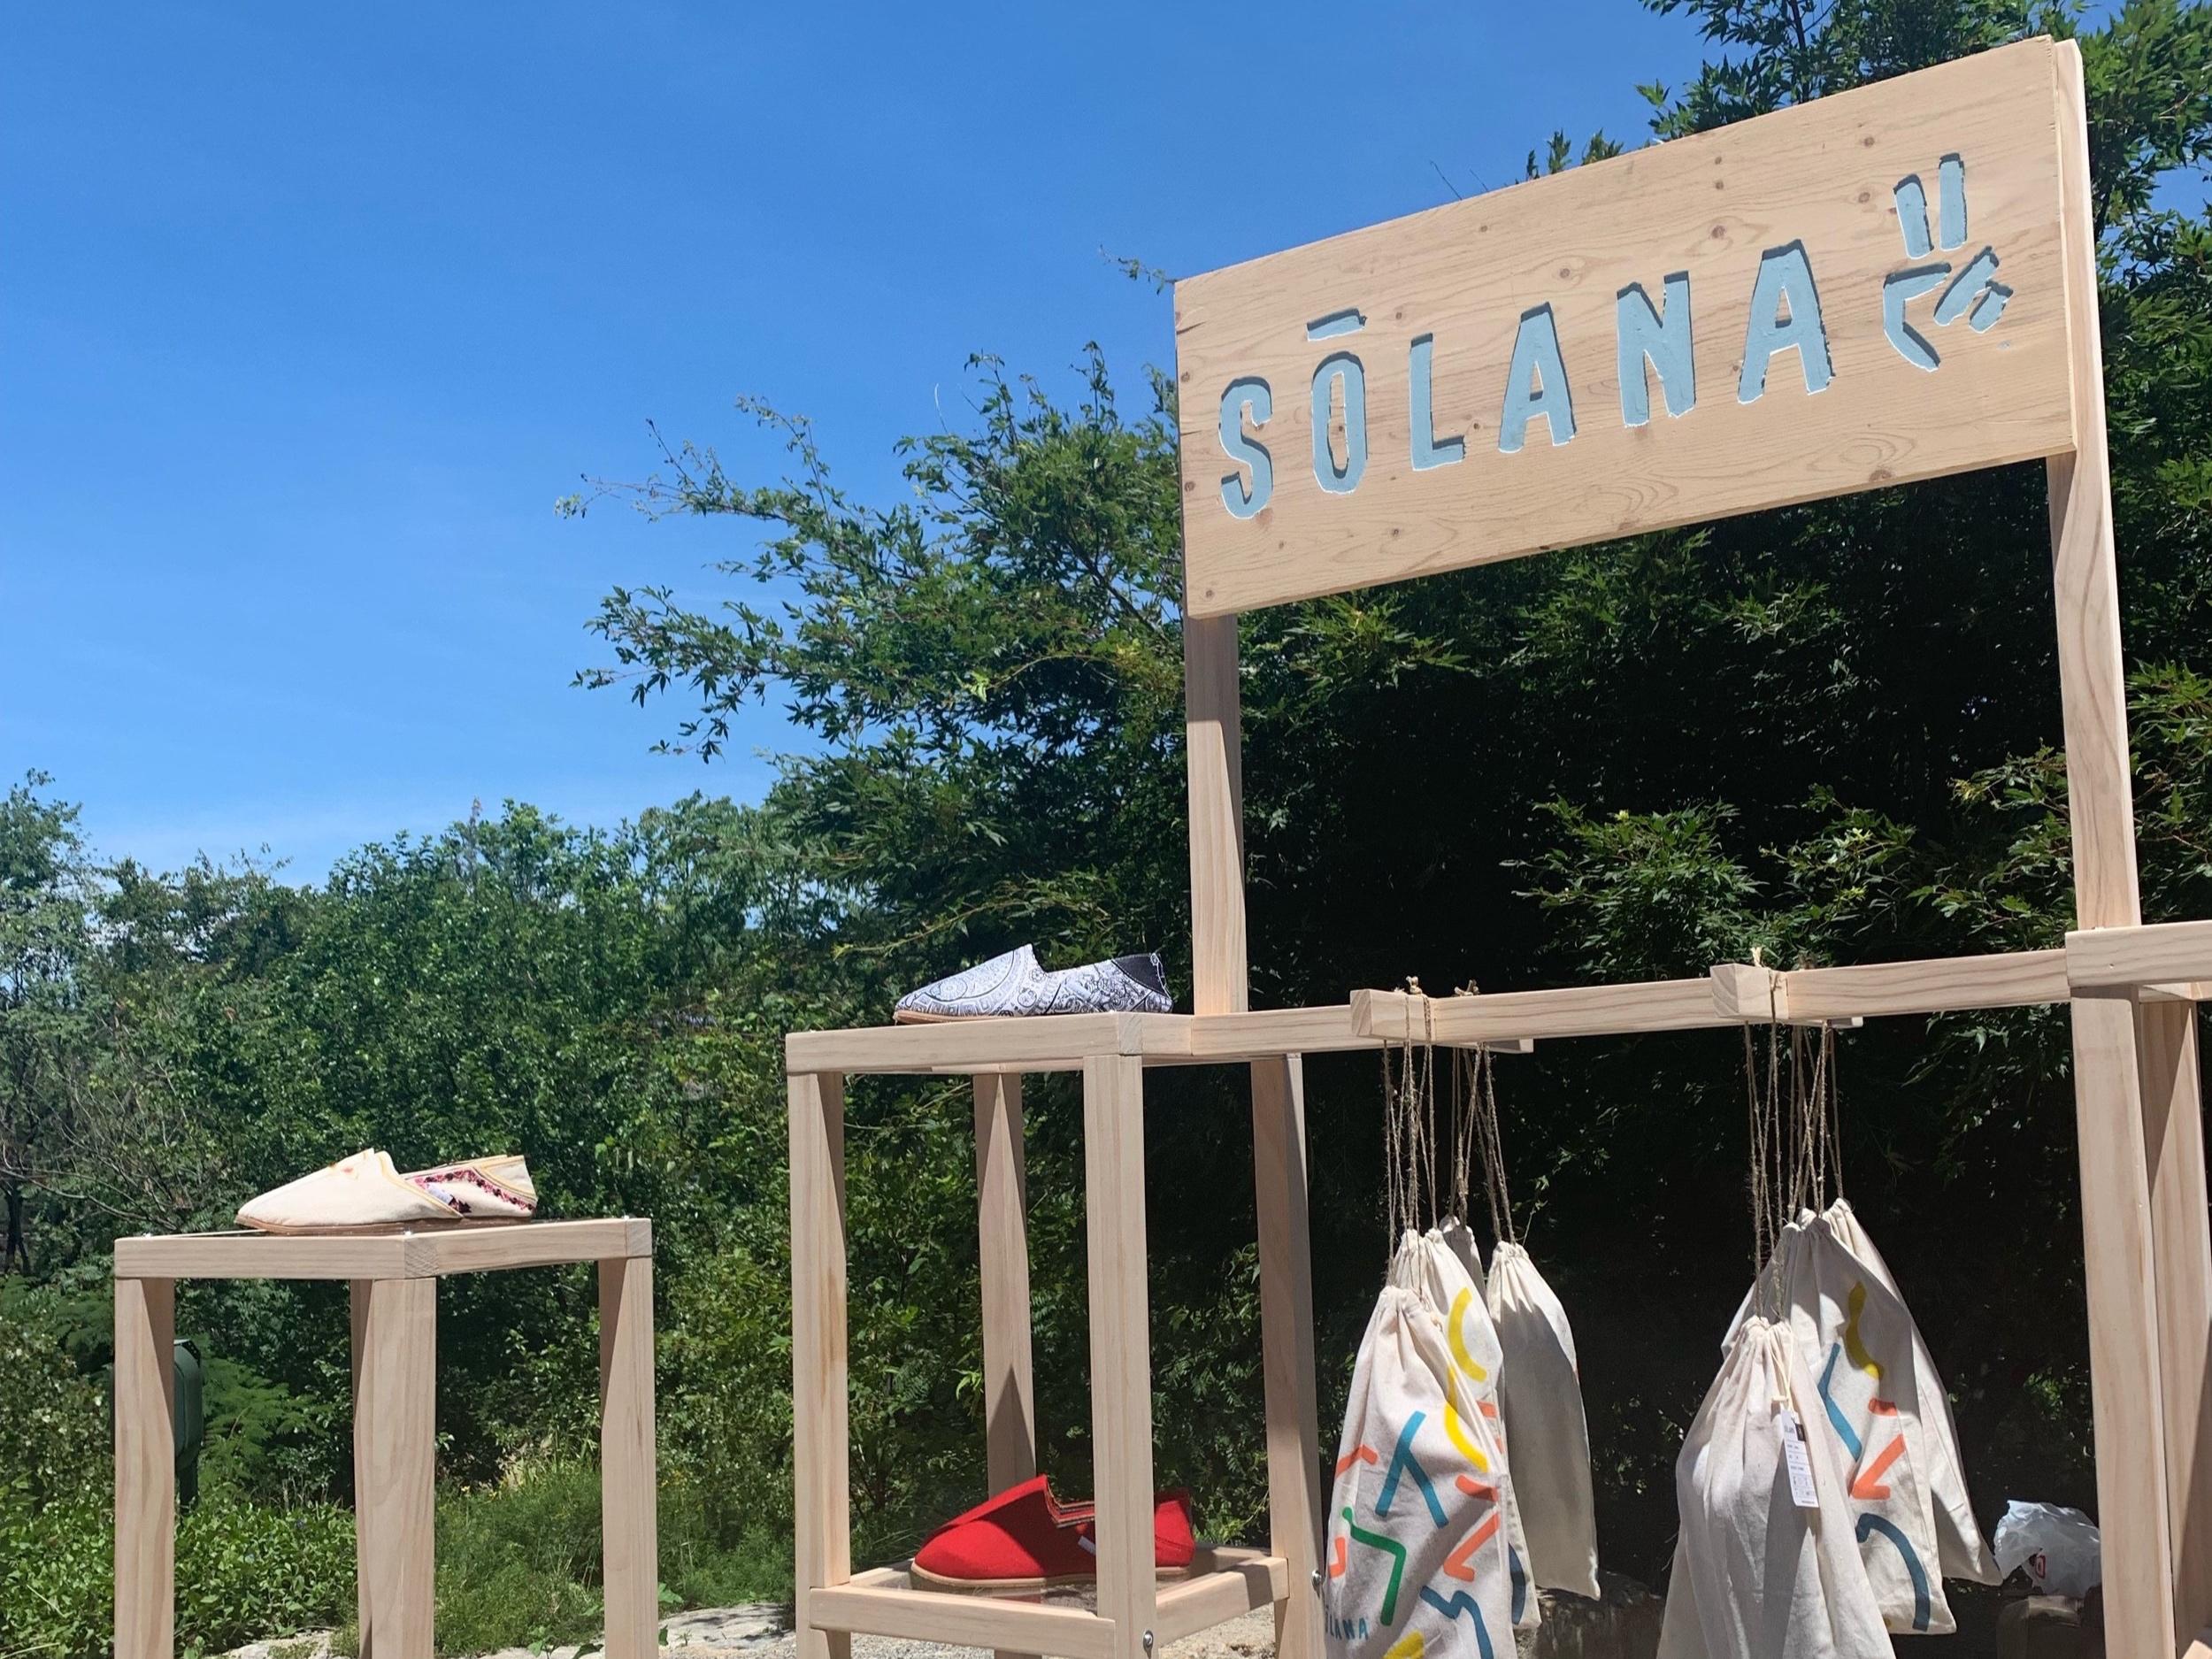 Solana - Shoe Company, Collapsible Shoe DisplayRichmond, VA